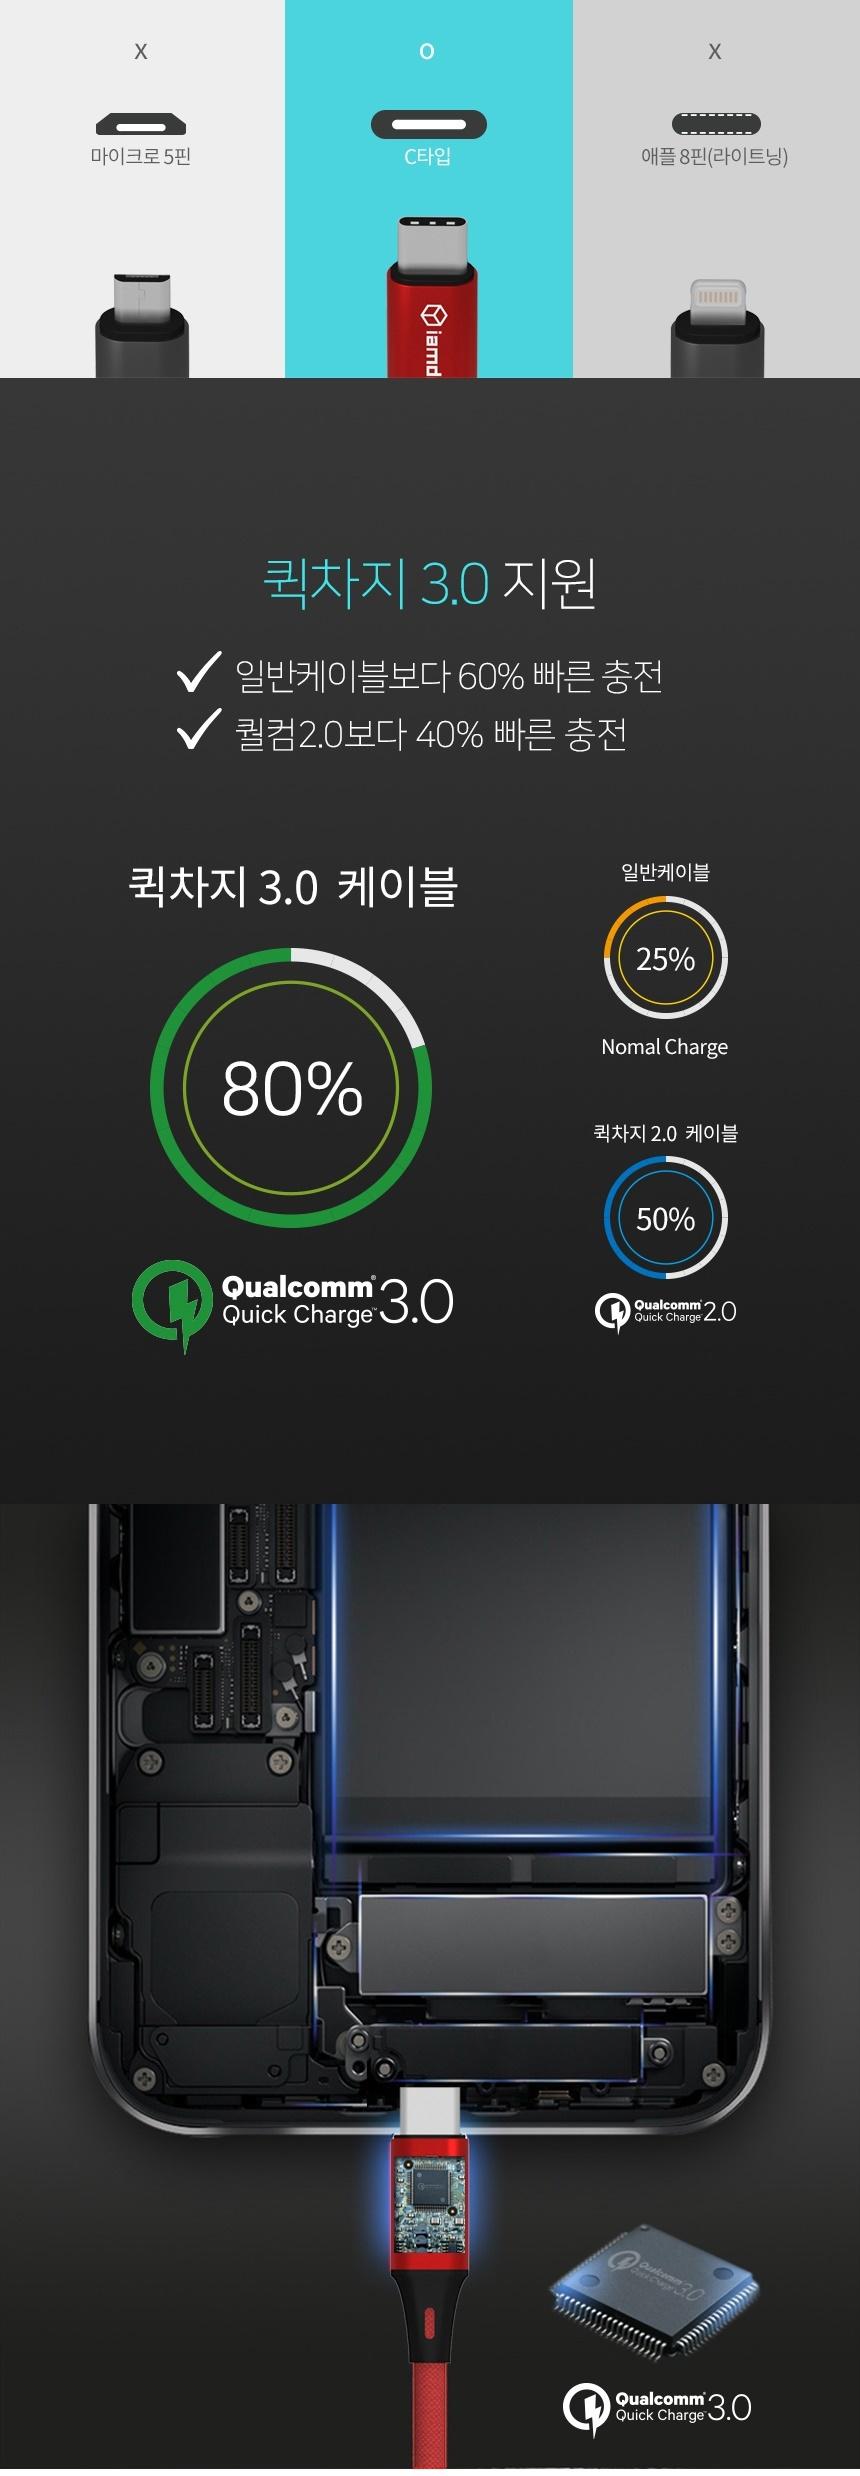 C타입 고속 충전 케이블 시폰 패브릭 - 아이엠듀, 1,900원, 케이블, C타입